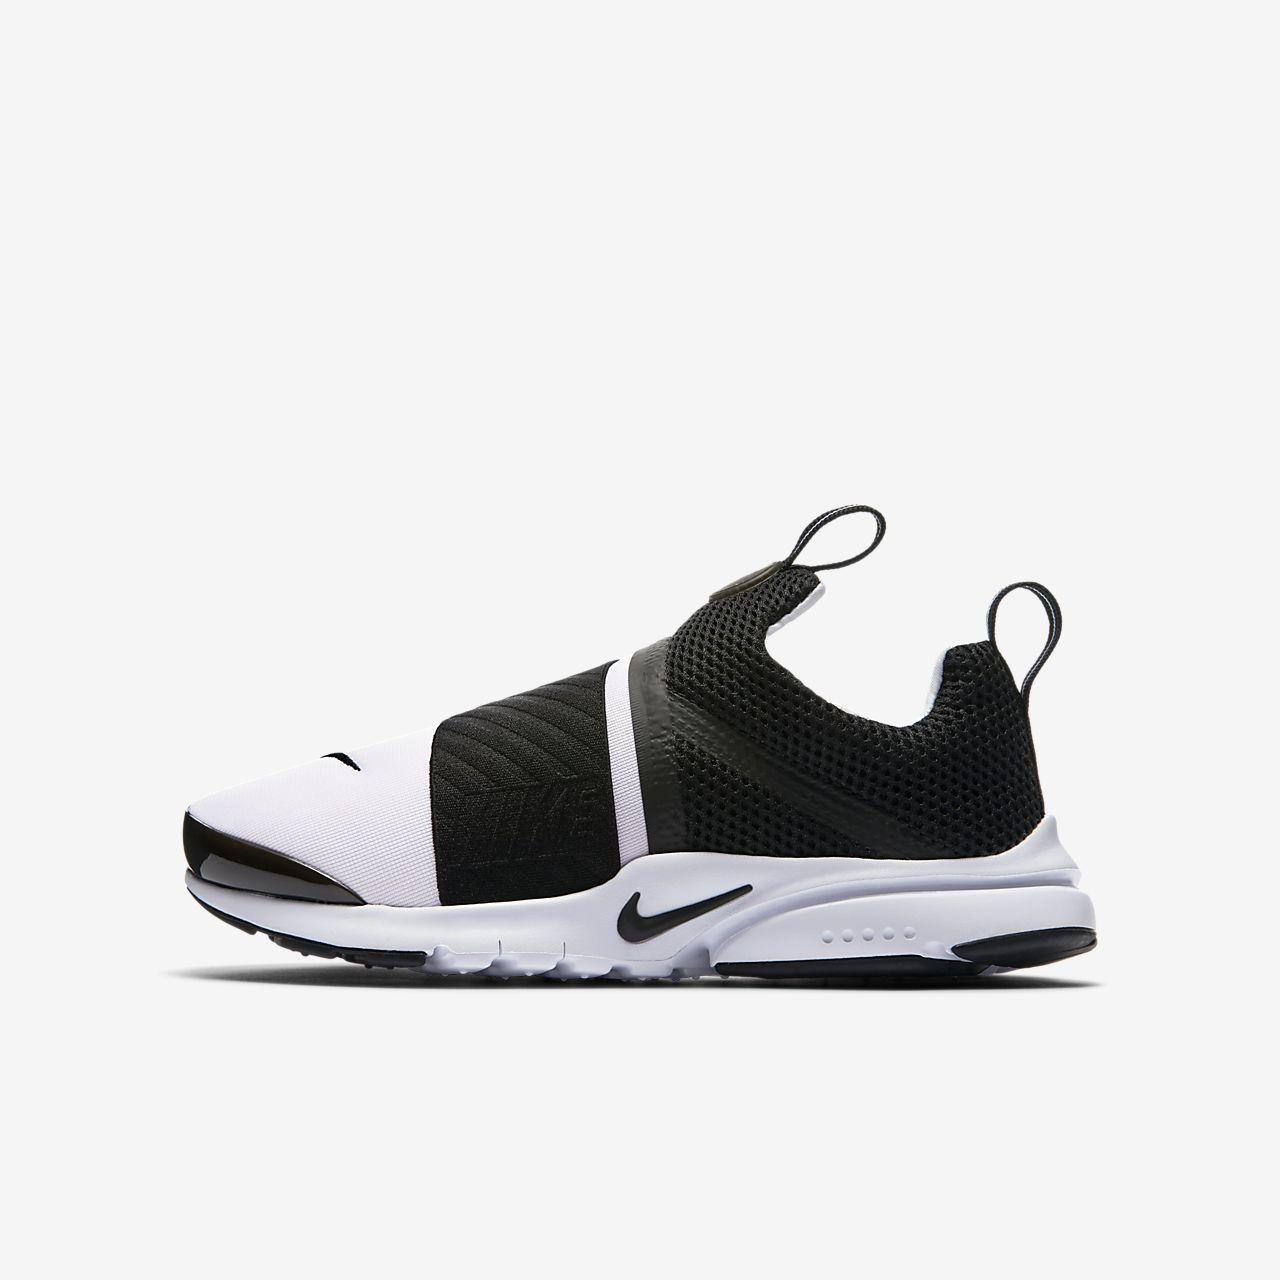 ab8c0c9cd47b Nike Presto Extreme Older Kids  Shoe. Nike.com IN